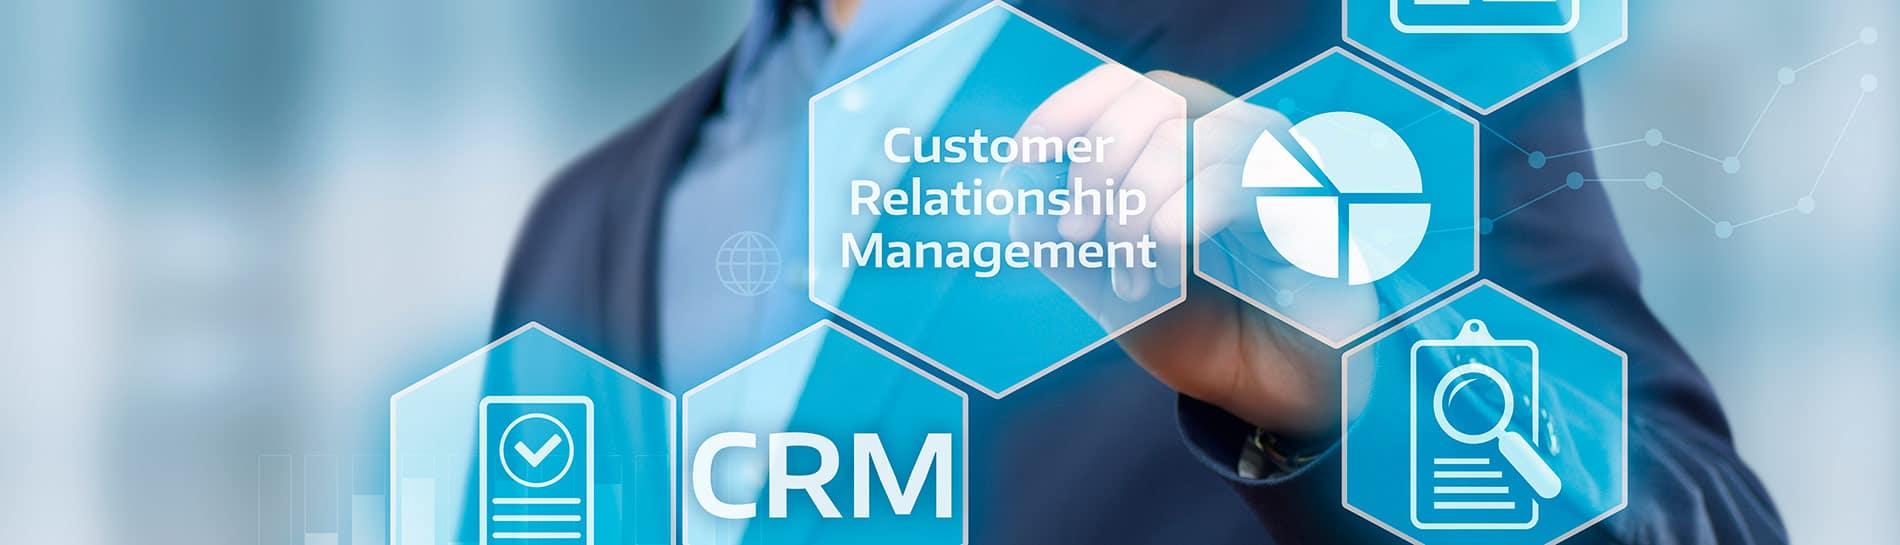 Hva er CRM - Customer Relationship Management